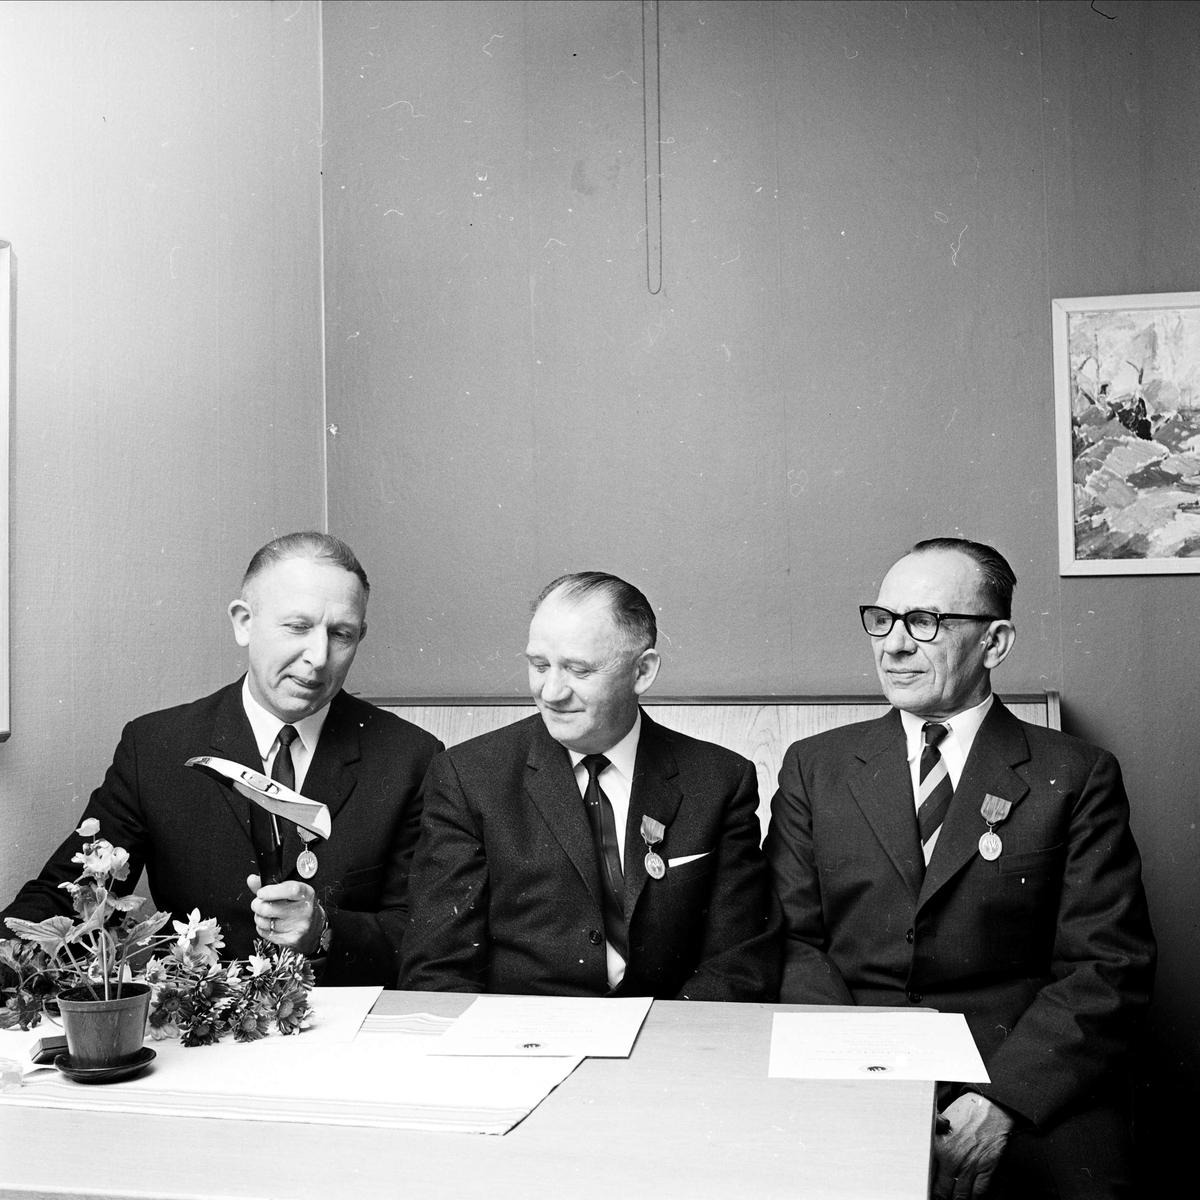 Belönade brandbefäl, sannolikt Tierp, Uppland, 1967